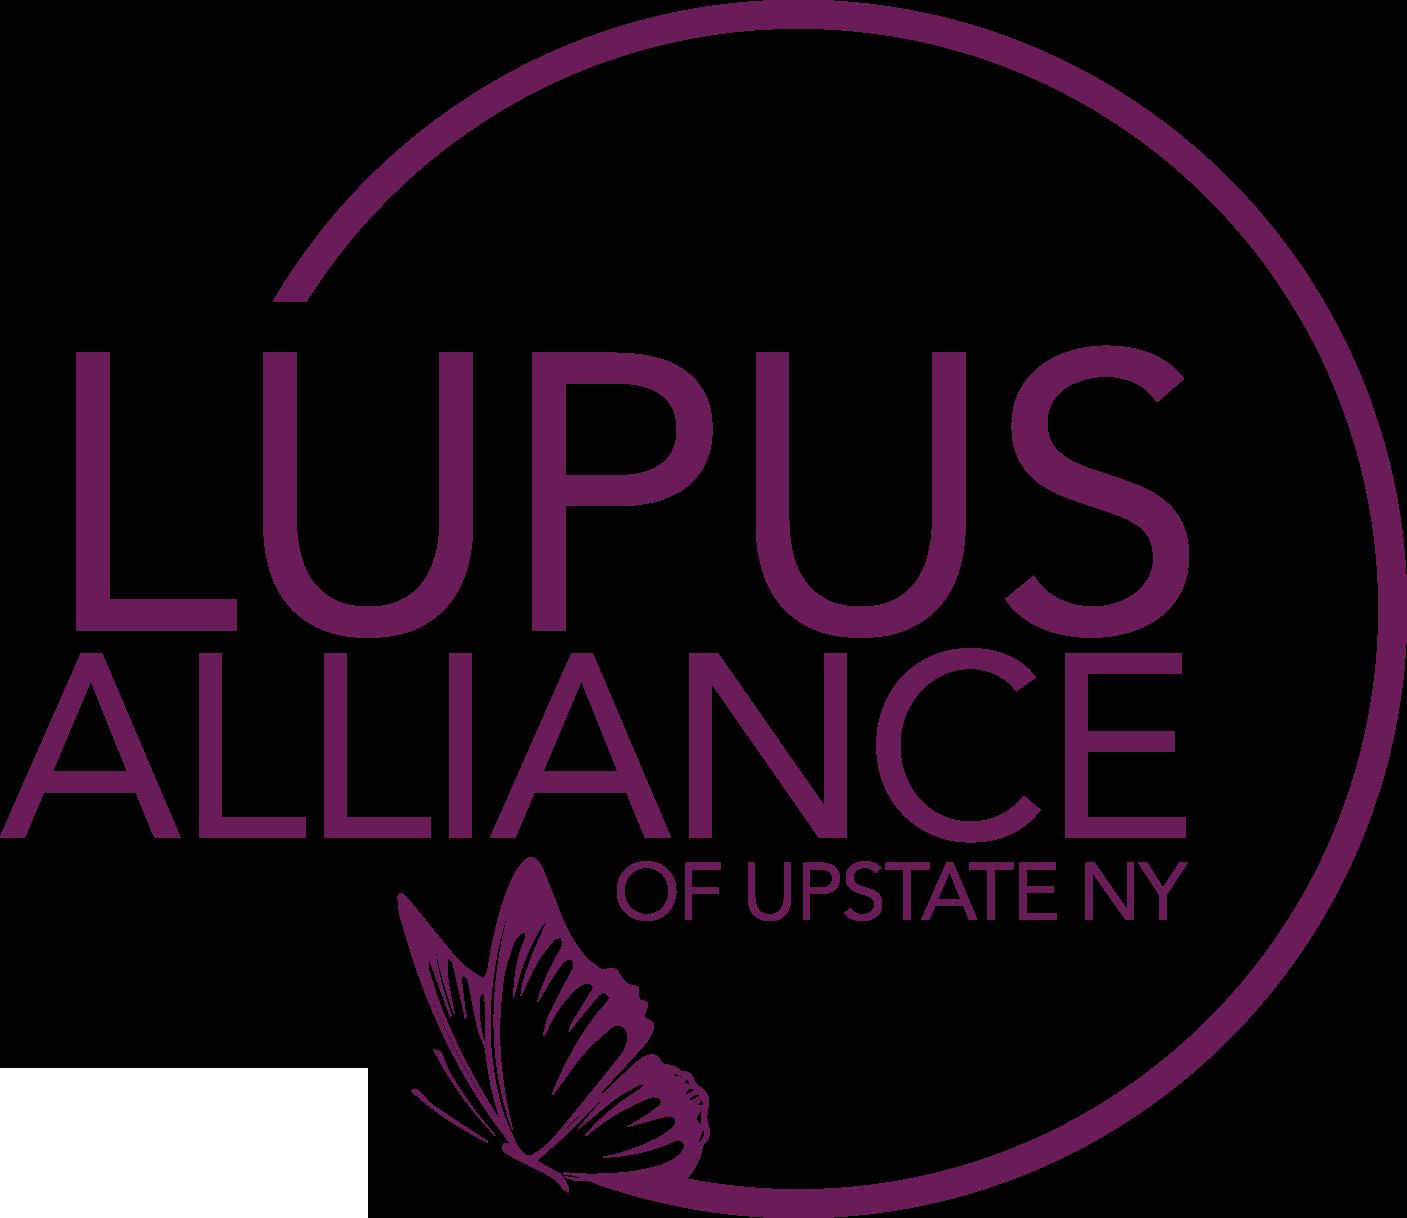 Lupus Alliance of Upstate New York logo